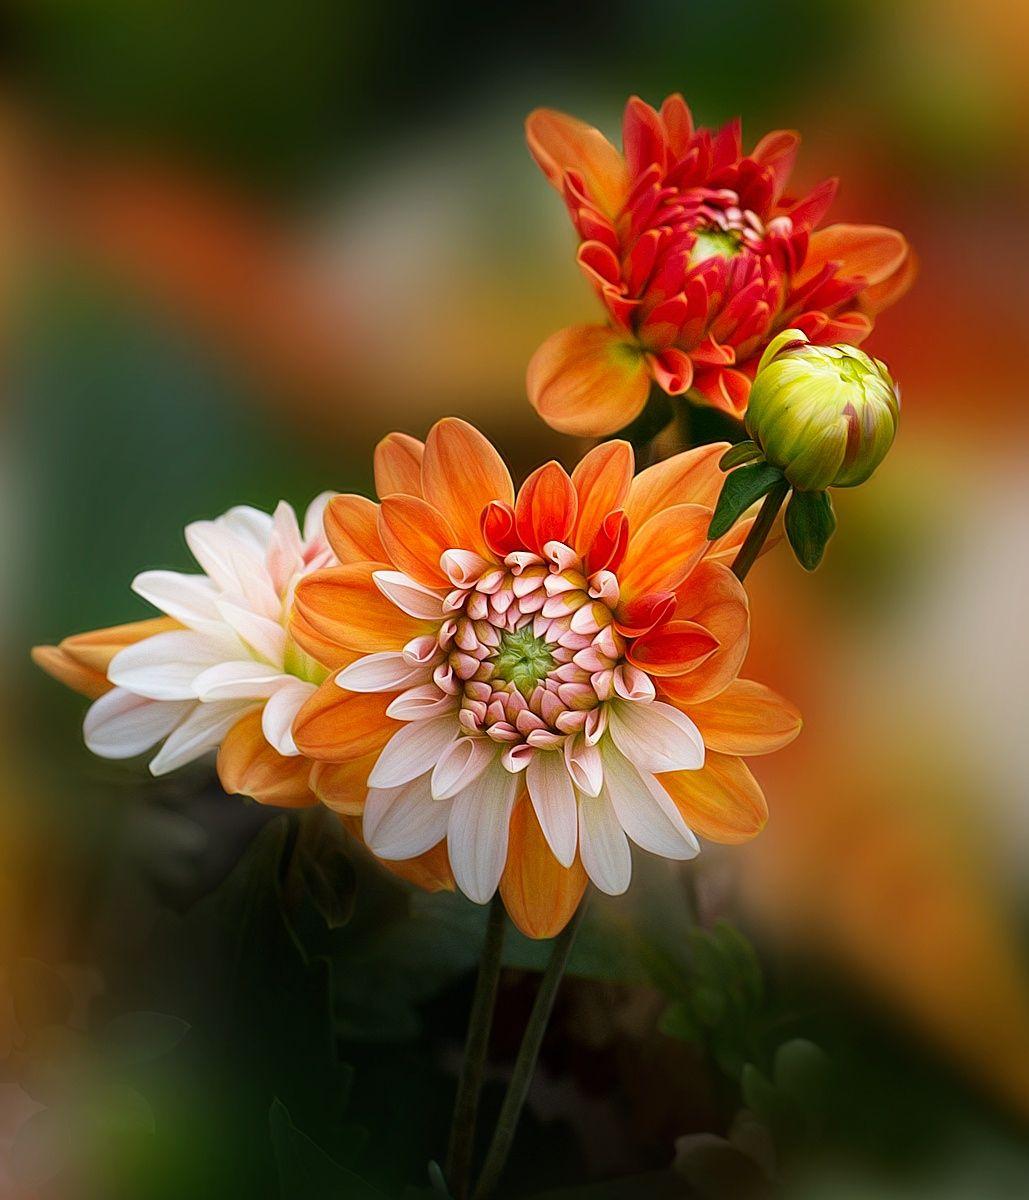 Dahlia Good Morning Flowers Morning Flowers Good Morning Rose Images